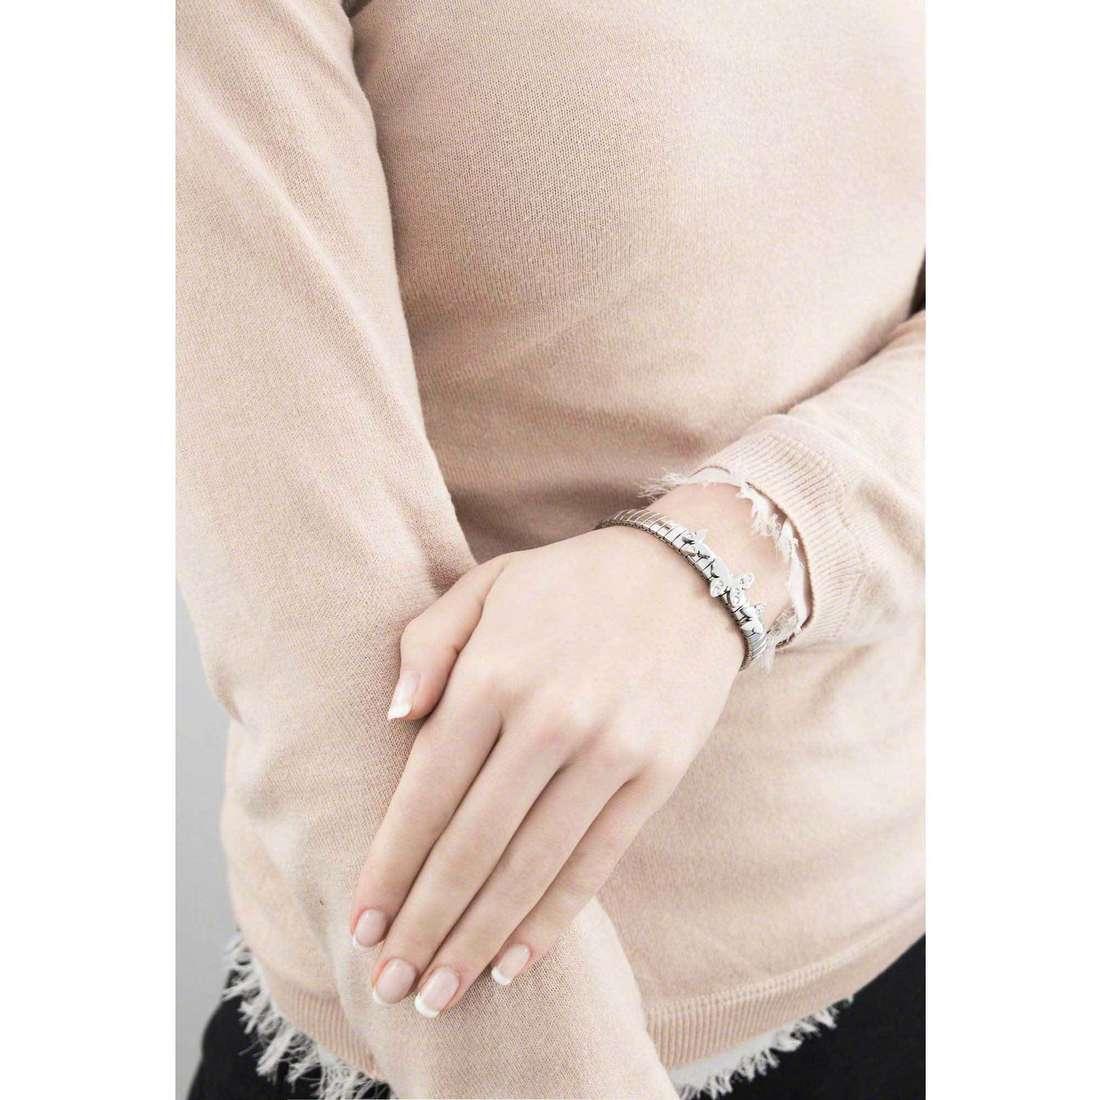 Nomination bracelets Butterfly femme 021300/001 photo wearing